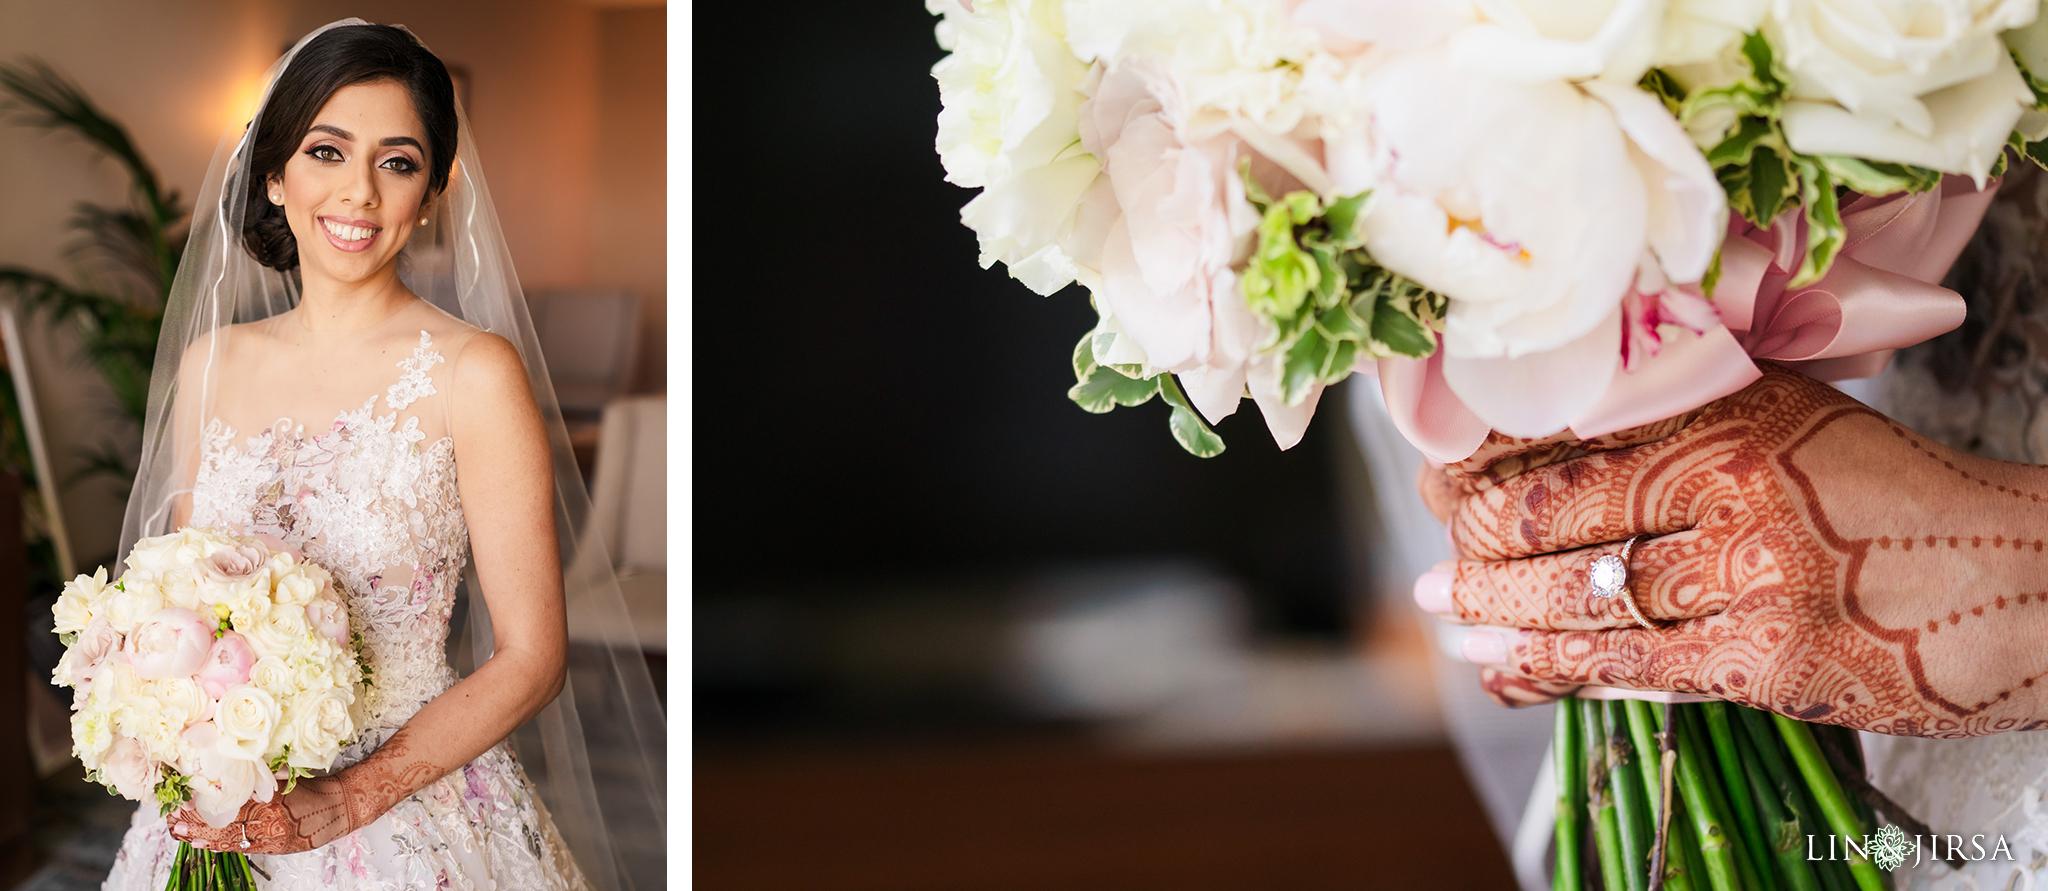 03 Newport Beach Marriott Indian Wedding Photography 1